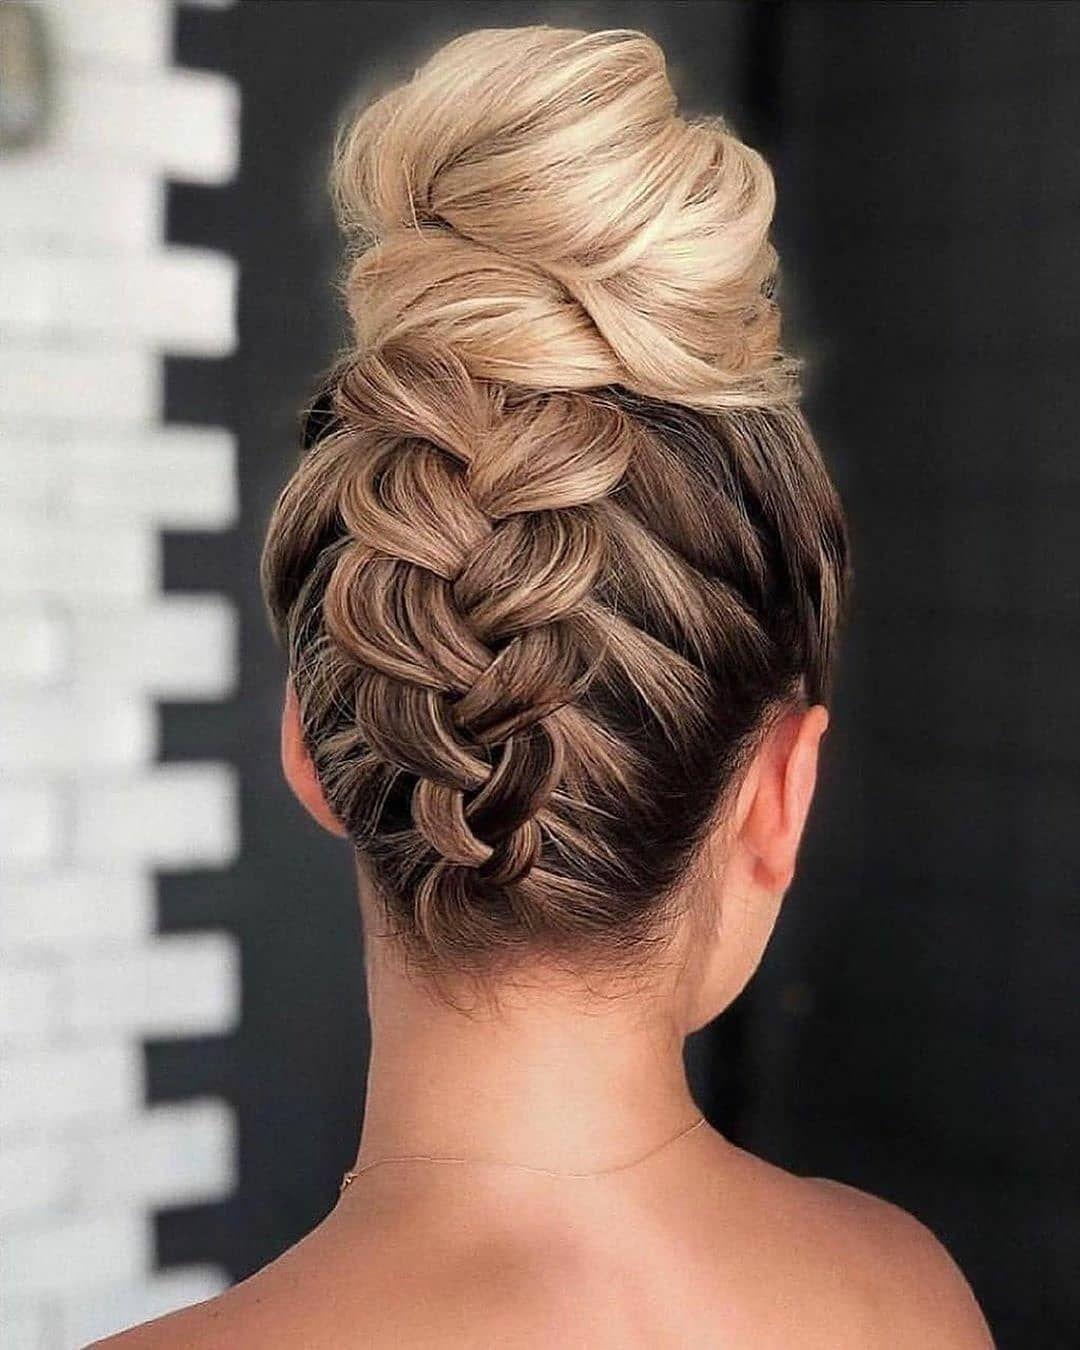 Gefallt 2 174 Mal 6 Kommentare All About Hair Hair Hd Auf Instagram 1 2 3 4 Or 5 Follow U In 2020 Hair Styles Braided Hairstyles Braided Hairstyles Updo